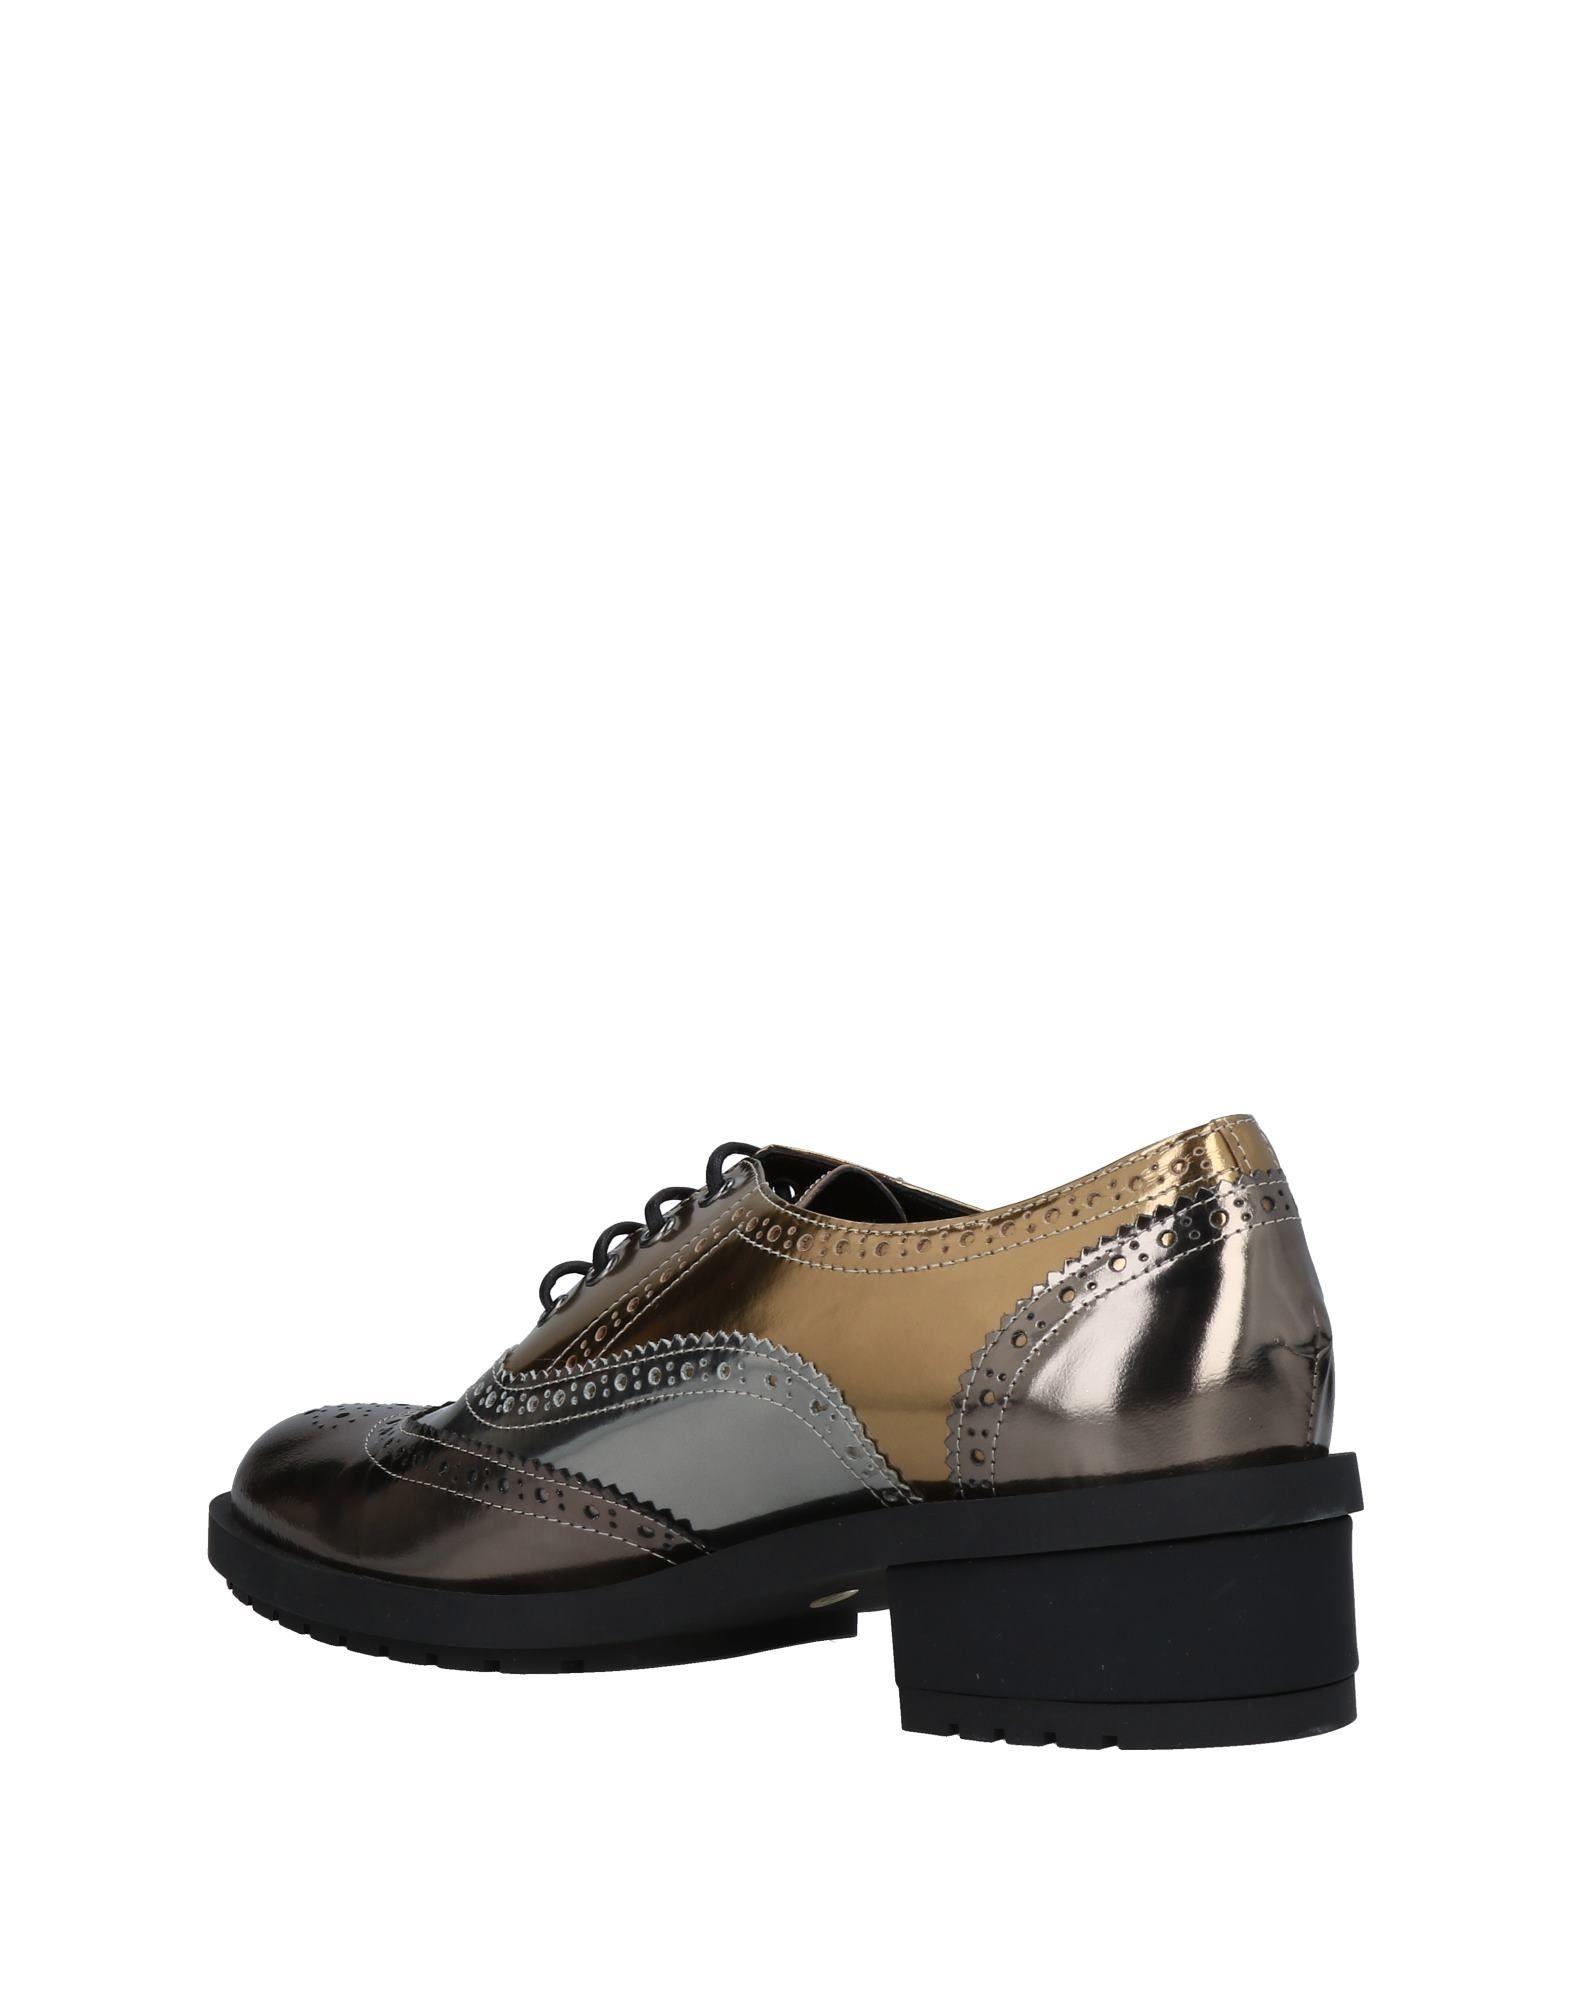 Le Marinē Gute Schnürschuhe Damen  11486761LE Gute Marinē Qualität beliebte Schuhe 6558c5